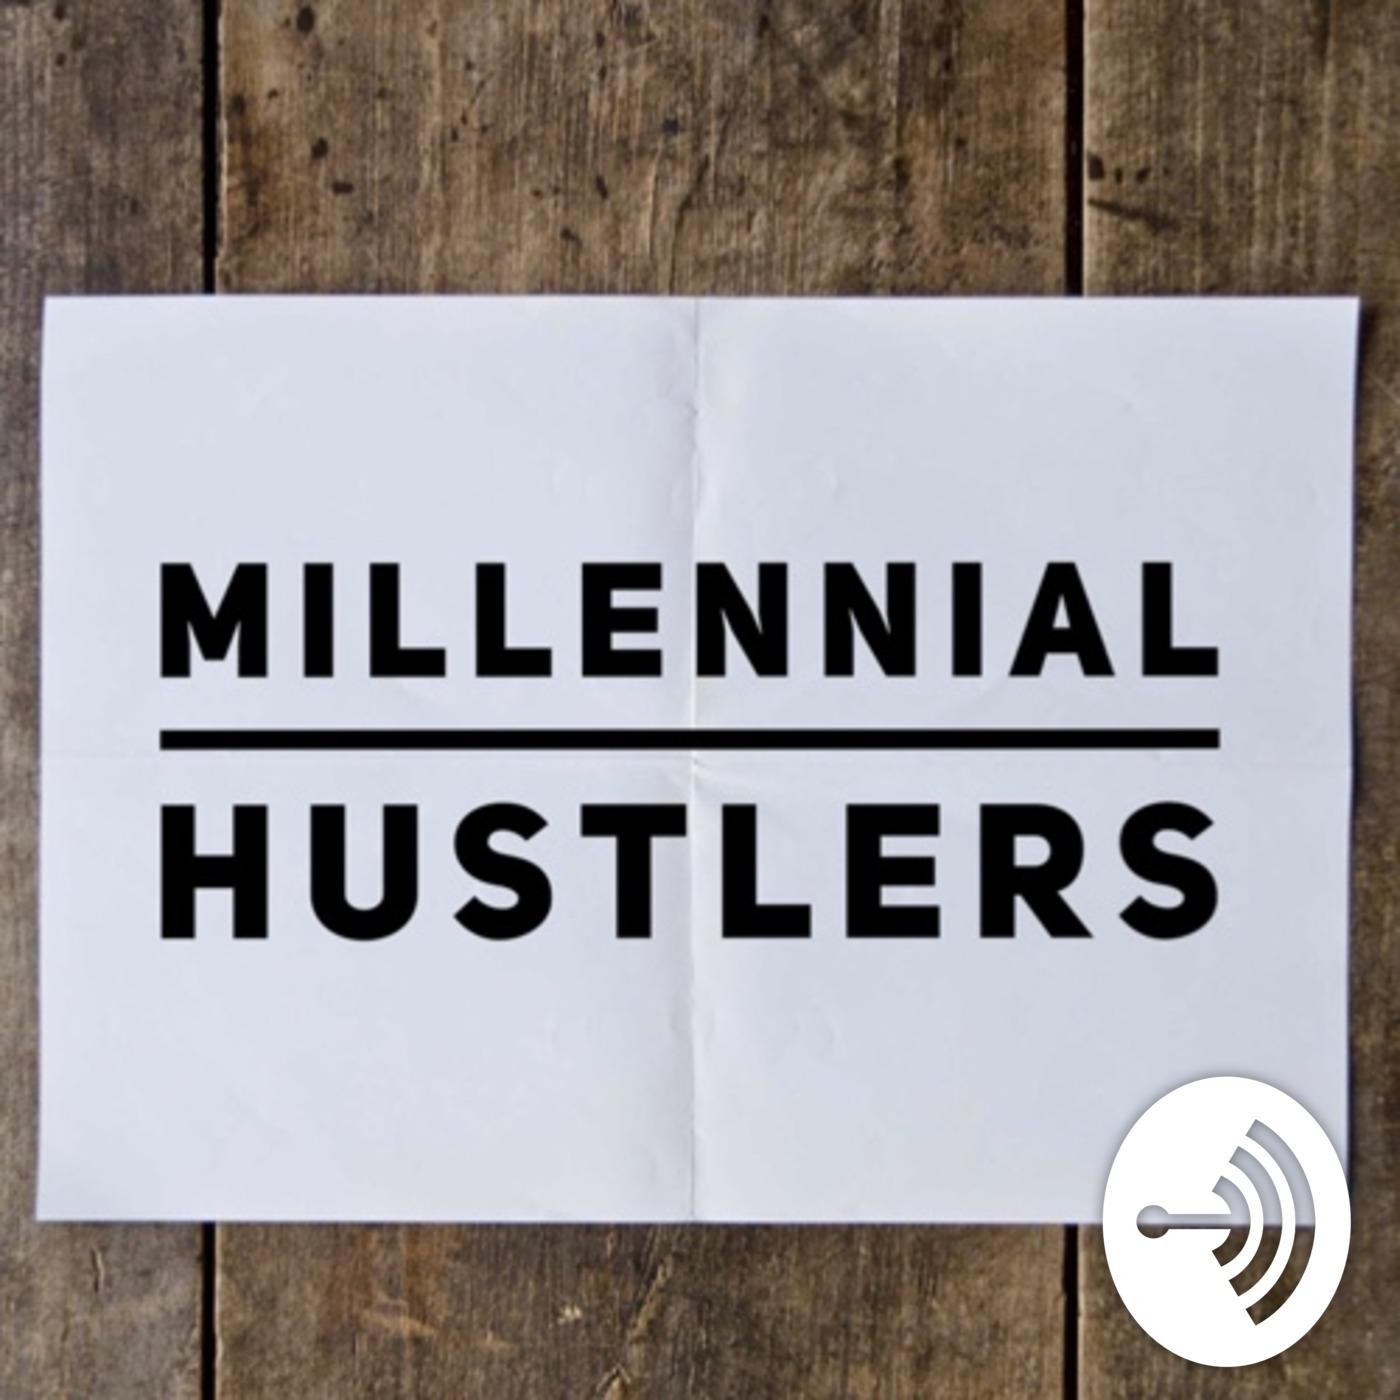 Gratitude for the millennial